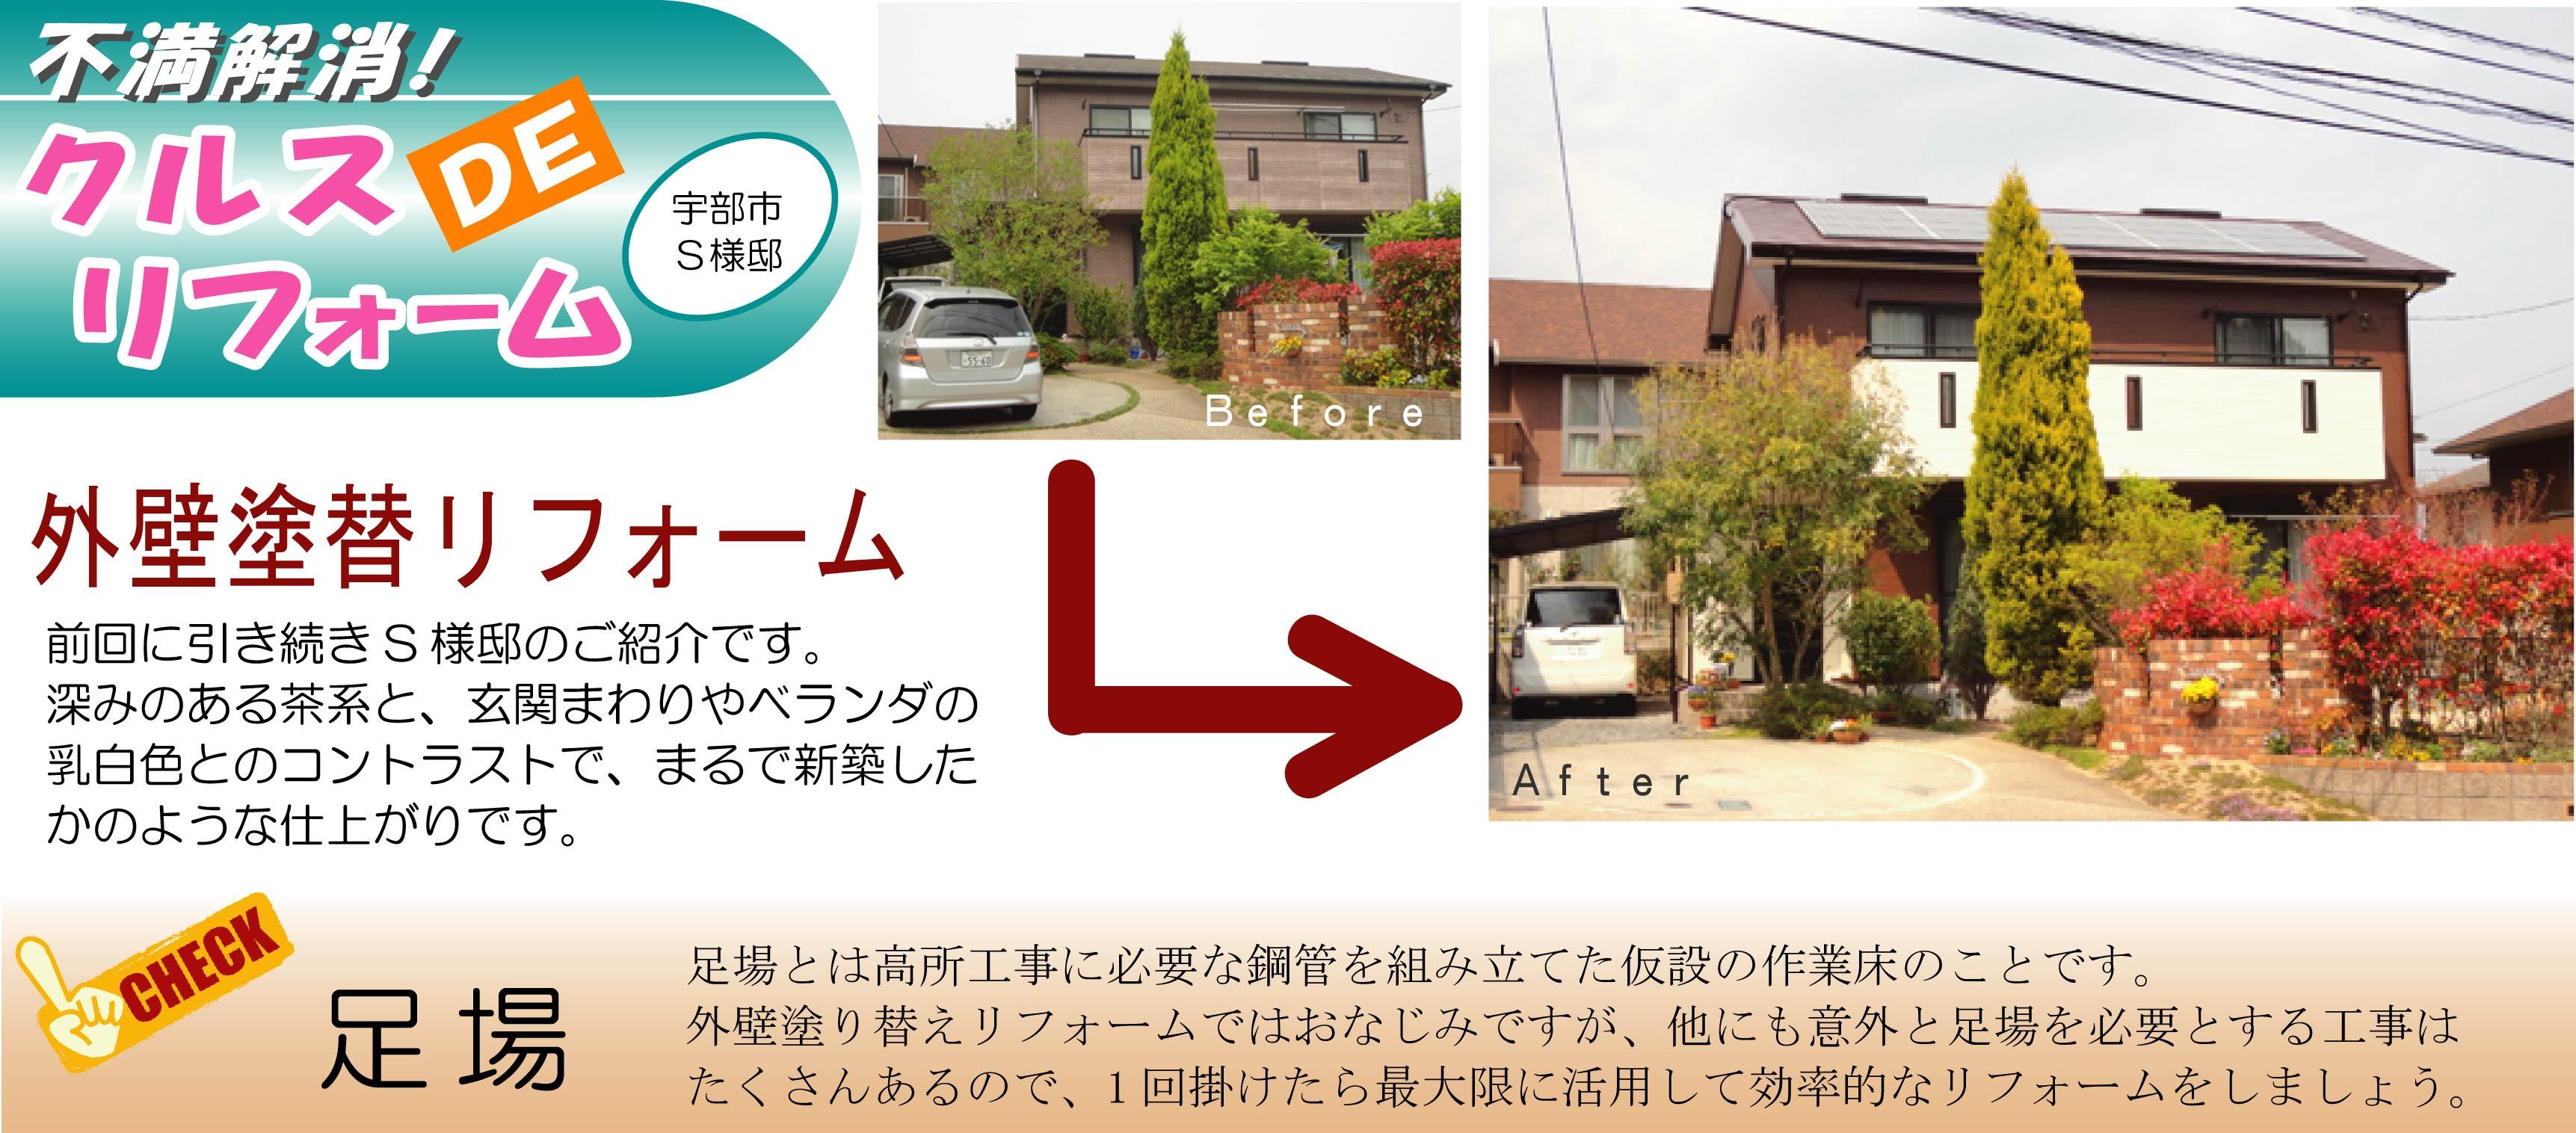 KuraSi-natu-sin72-10.jpg